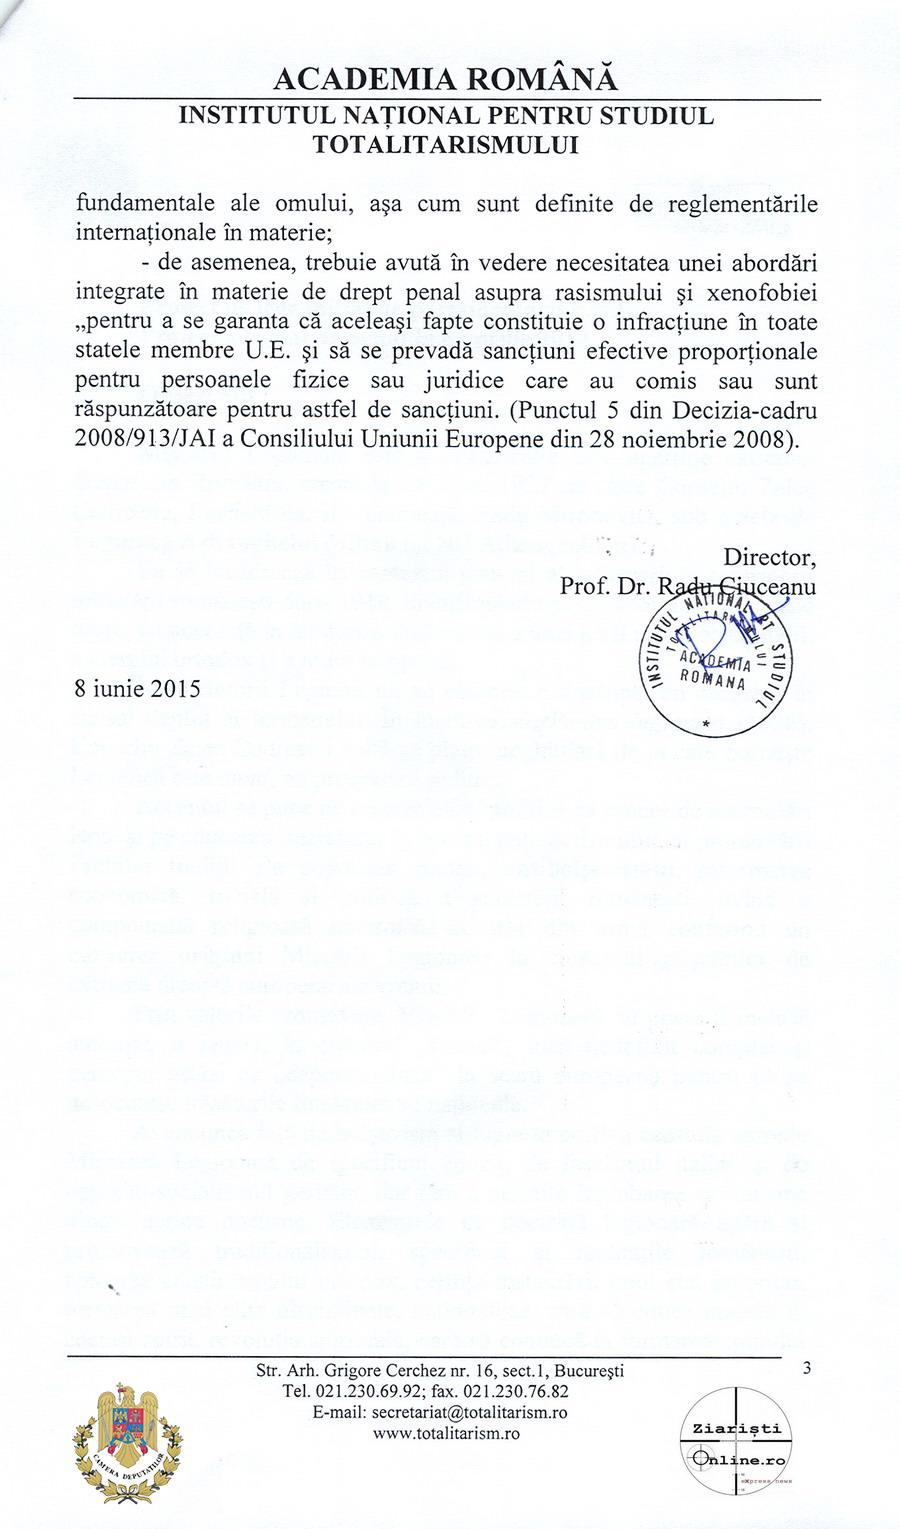 Academia-Romana-INST-despre-Miscarea-Legionara-03-Iunie-2015-Camera-Deputatilor-Ziaristi-Online